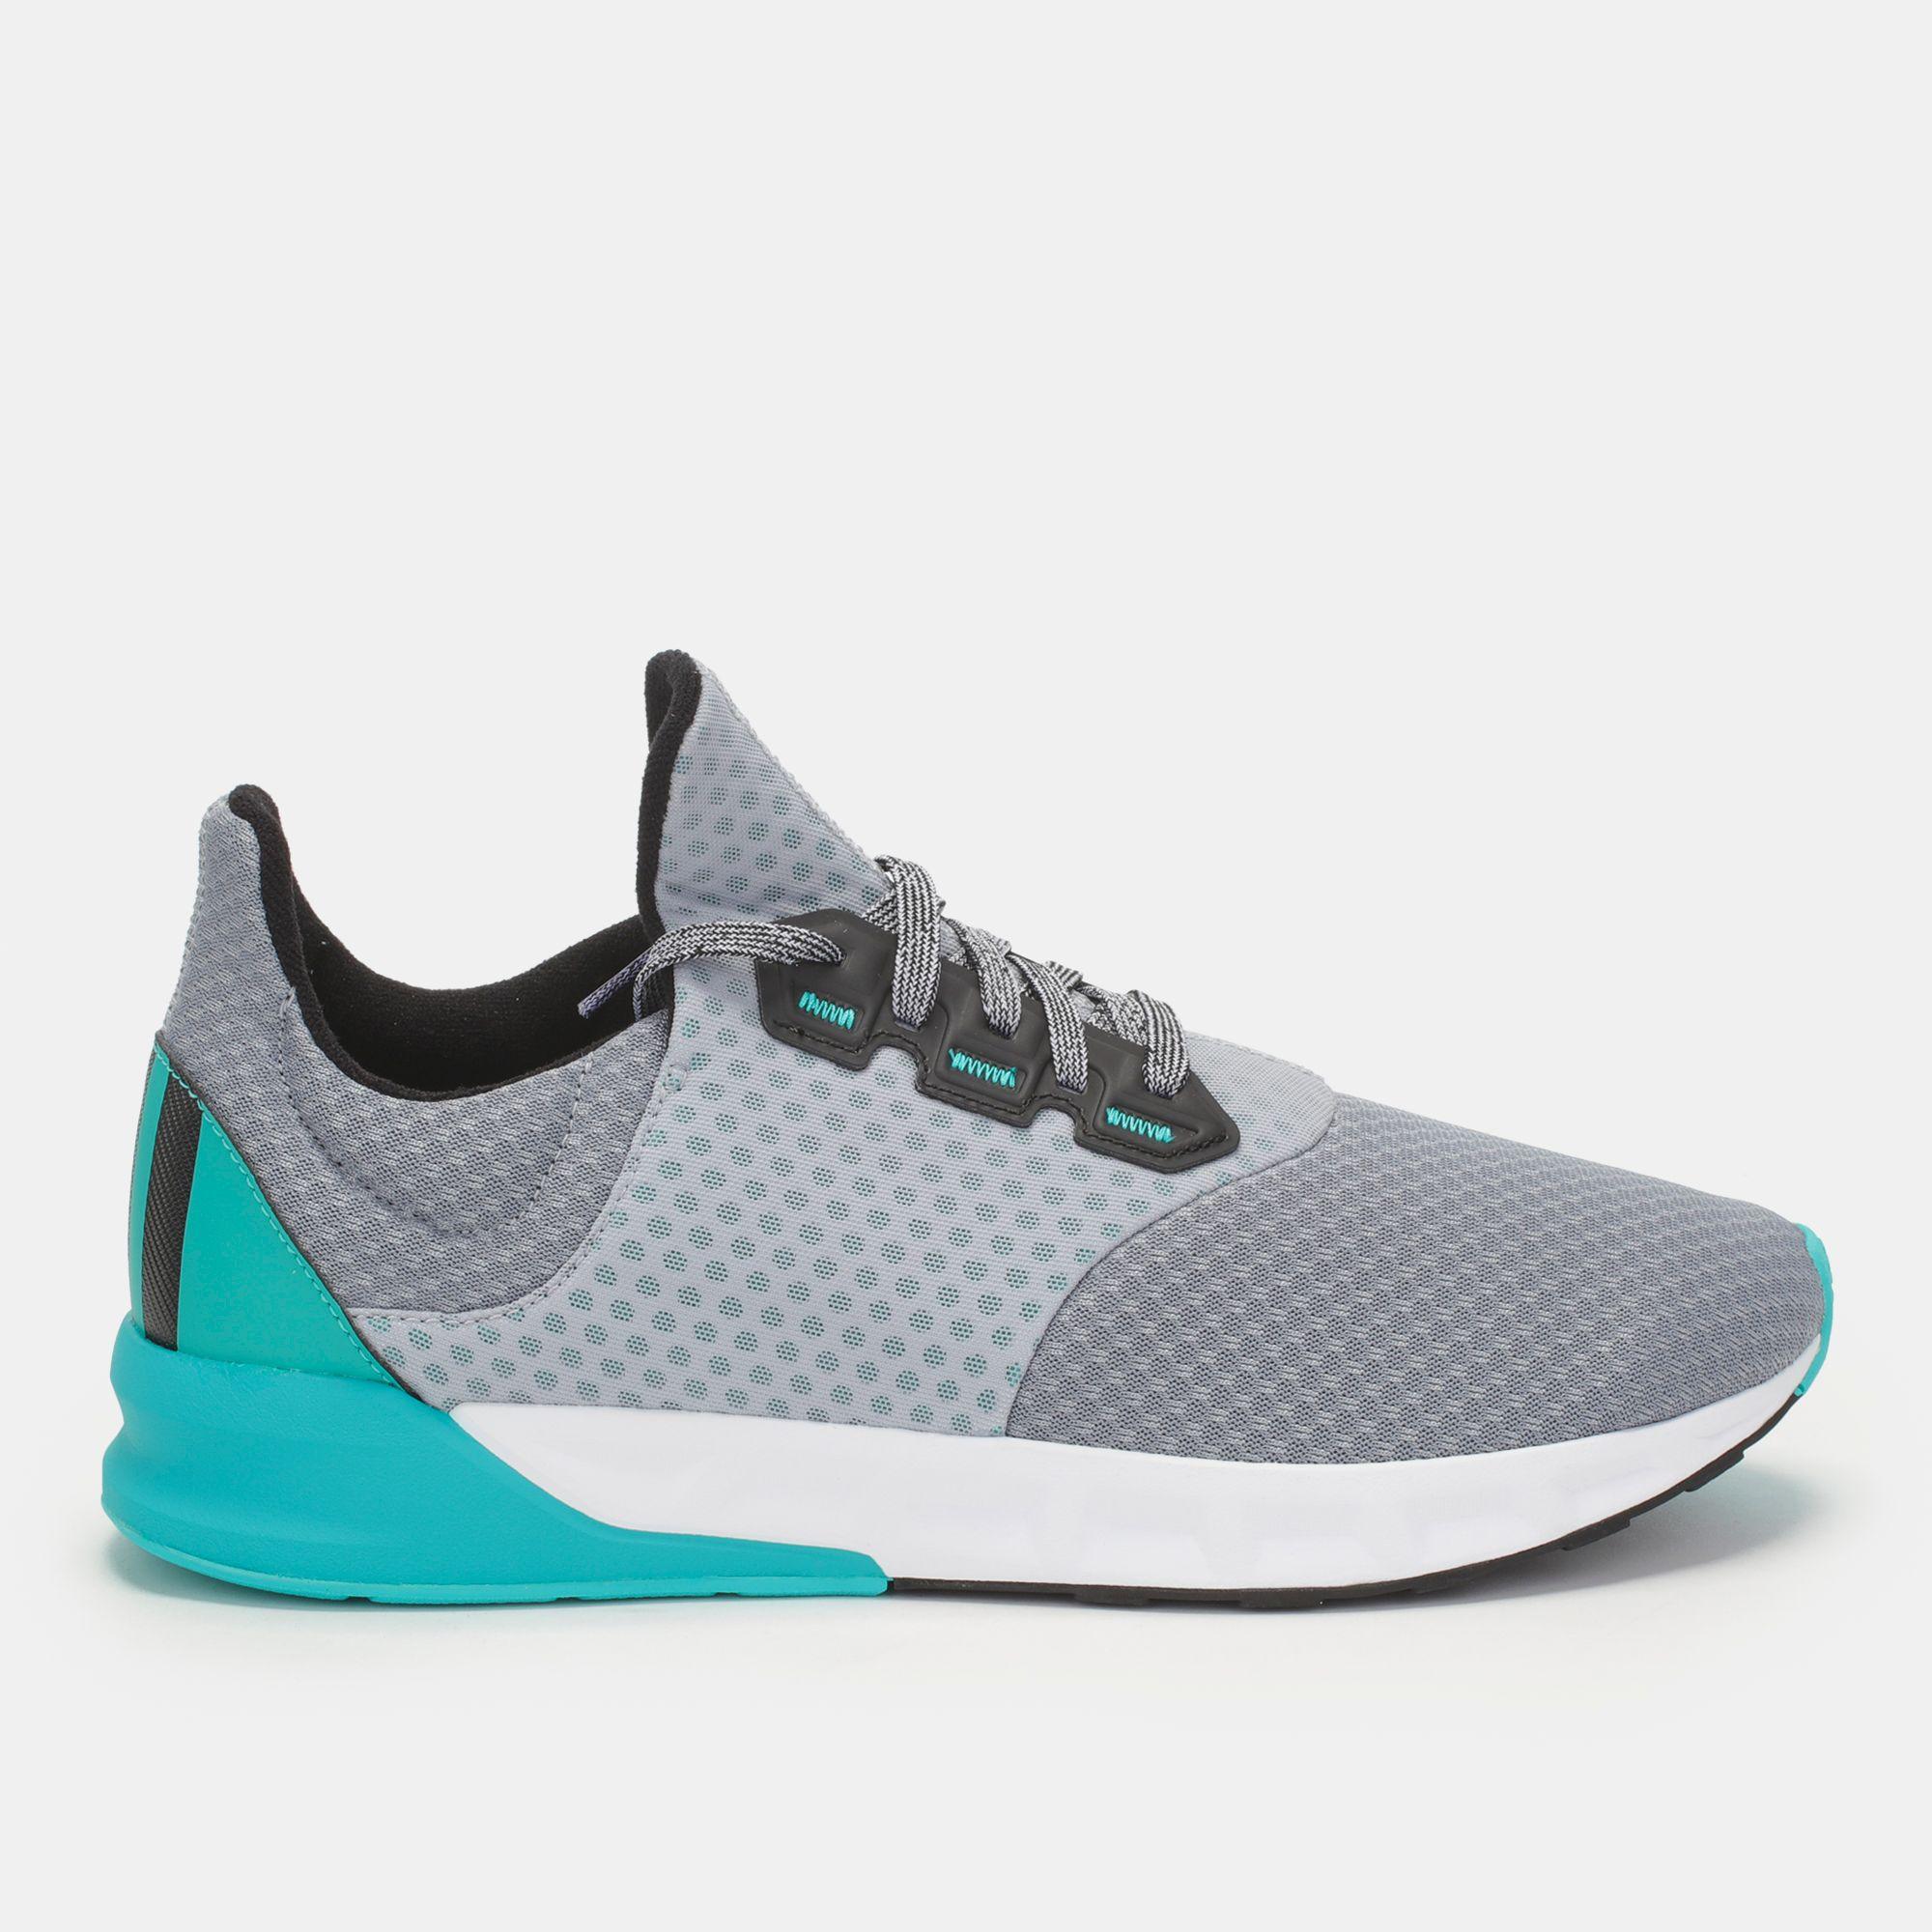 620c82098e4faa Shop Grey adidas Falcon Elite 5 M Shoe for Mens by adidas